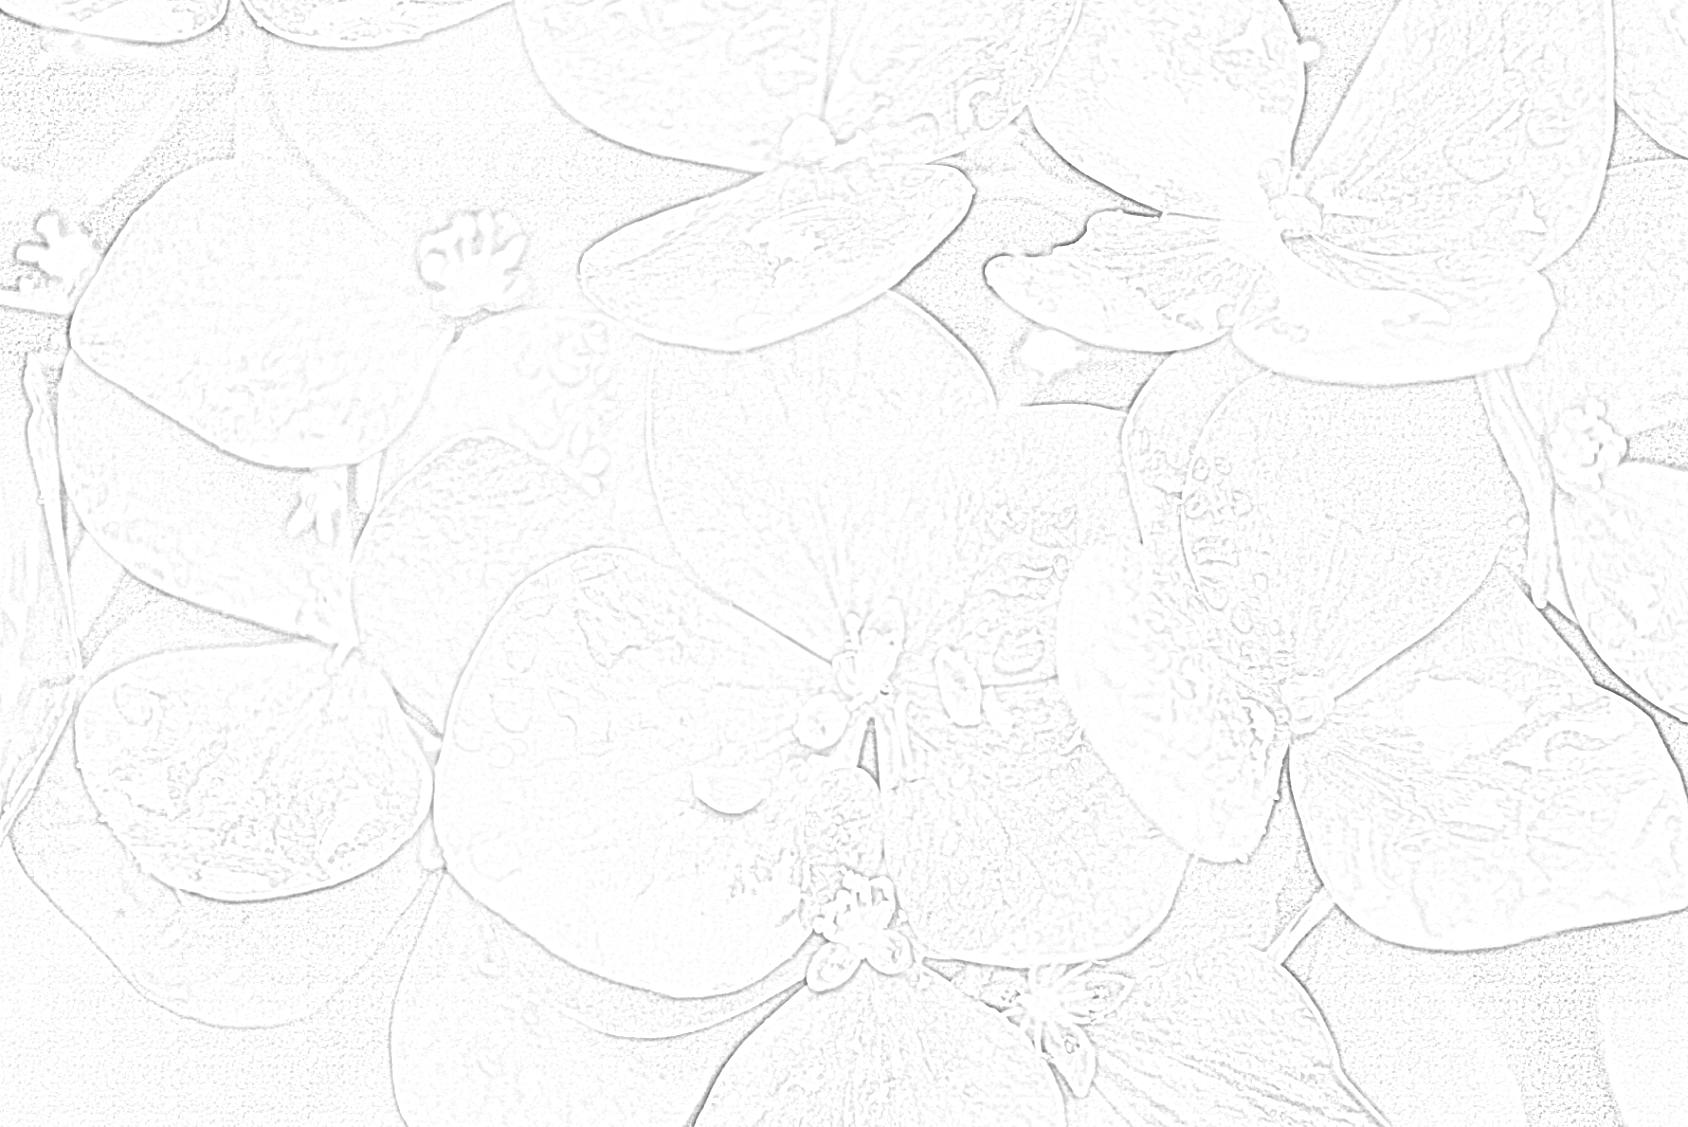 Hydrangeas coloring page